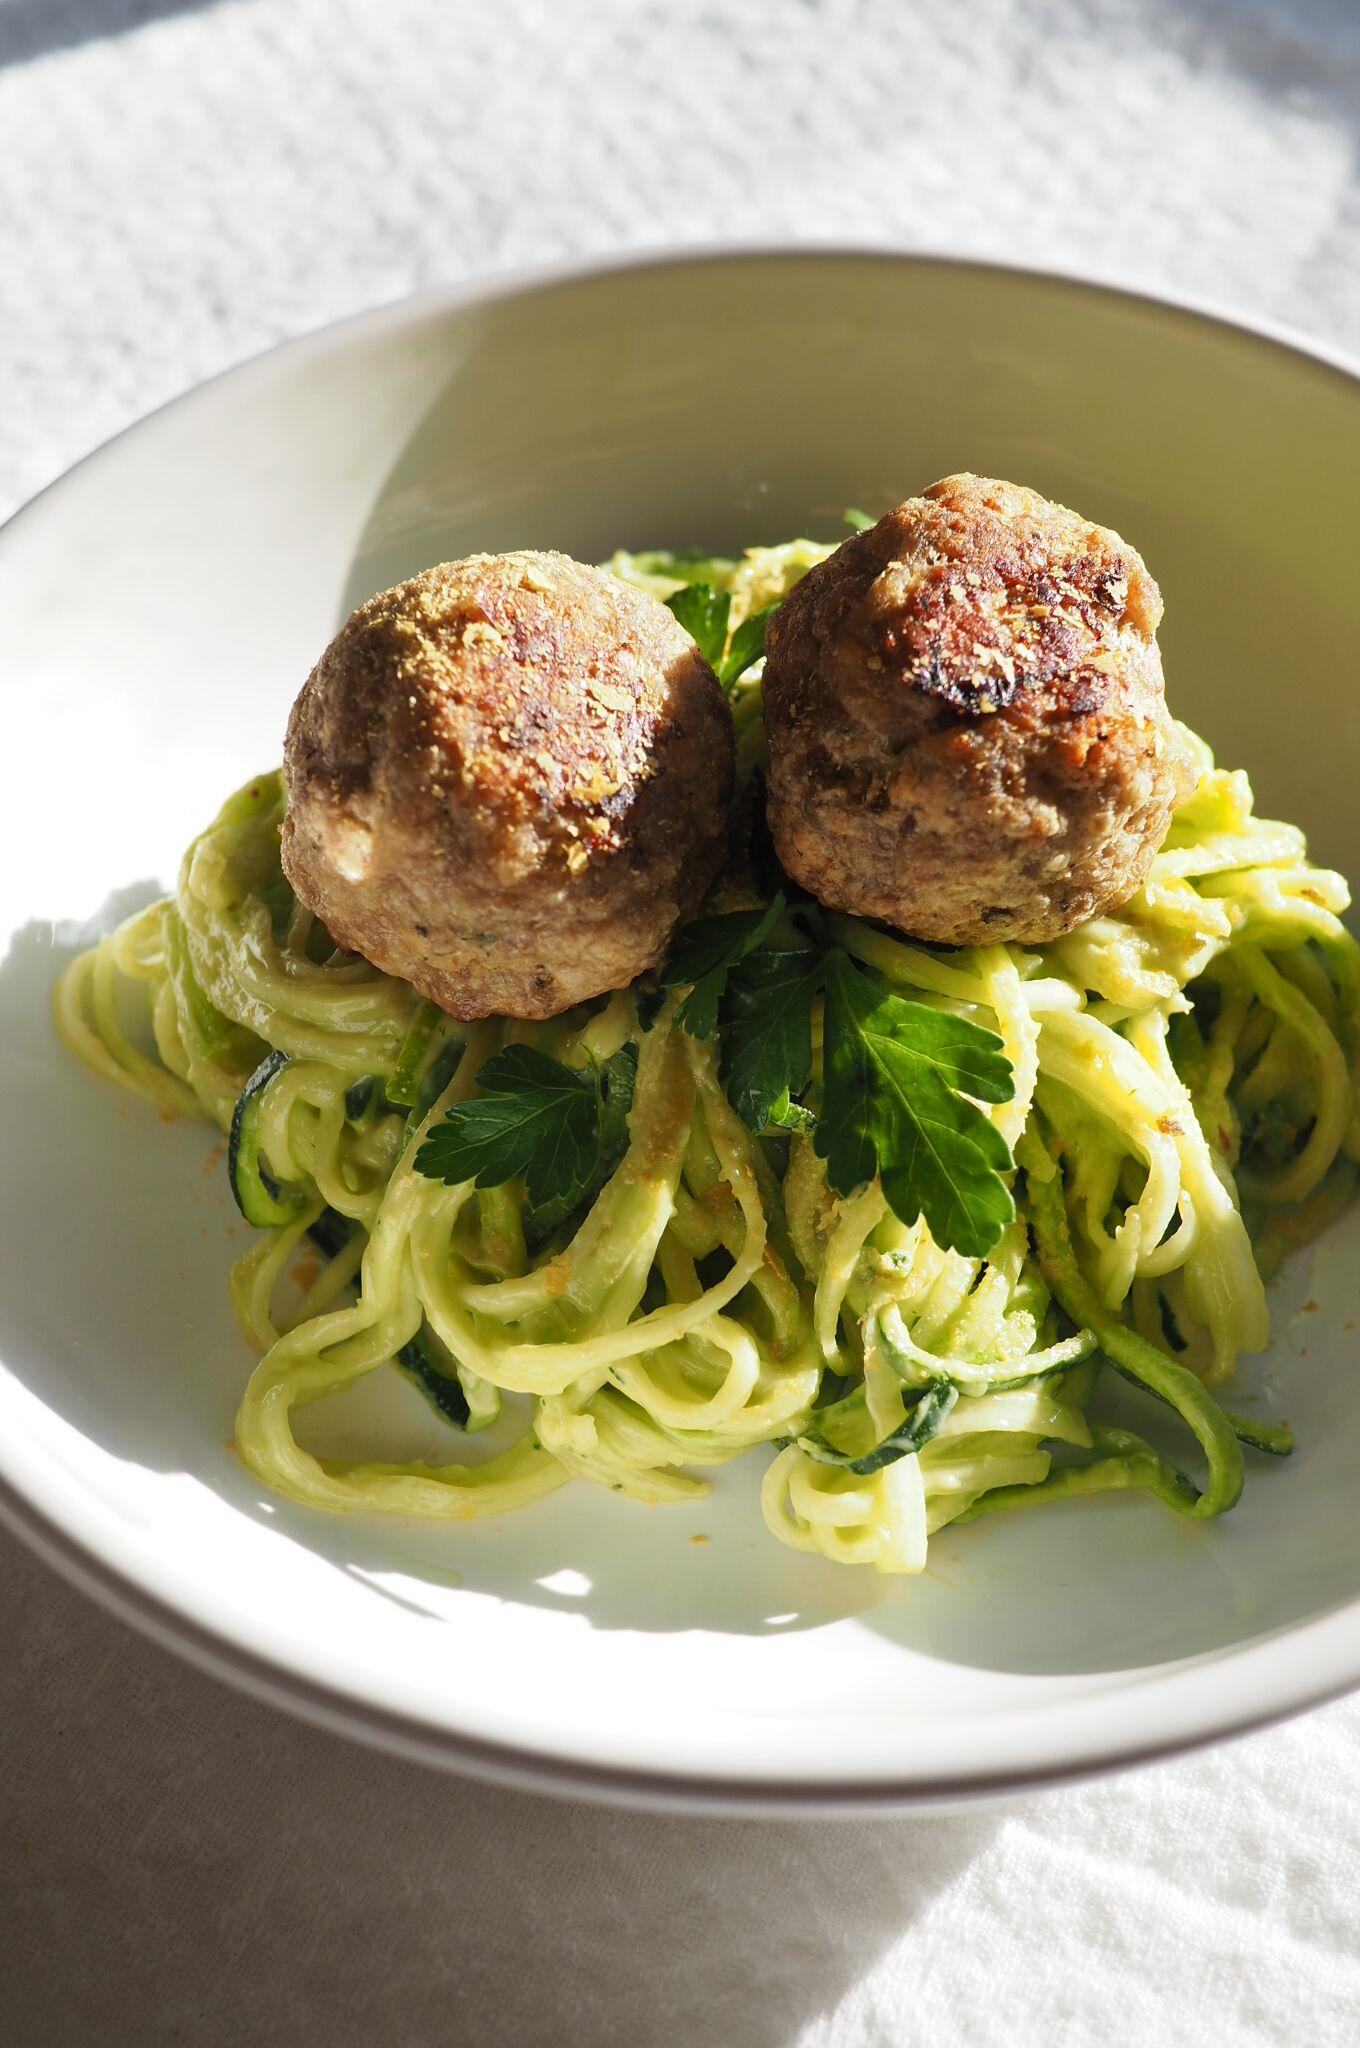 Creamy Avocado Zoodles With Turkey Meatballs - Kris Gill